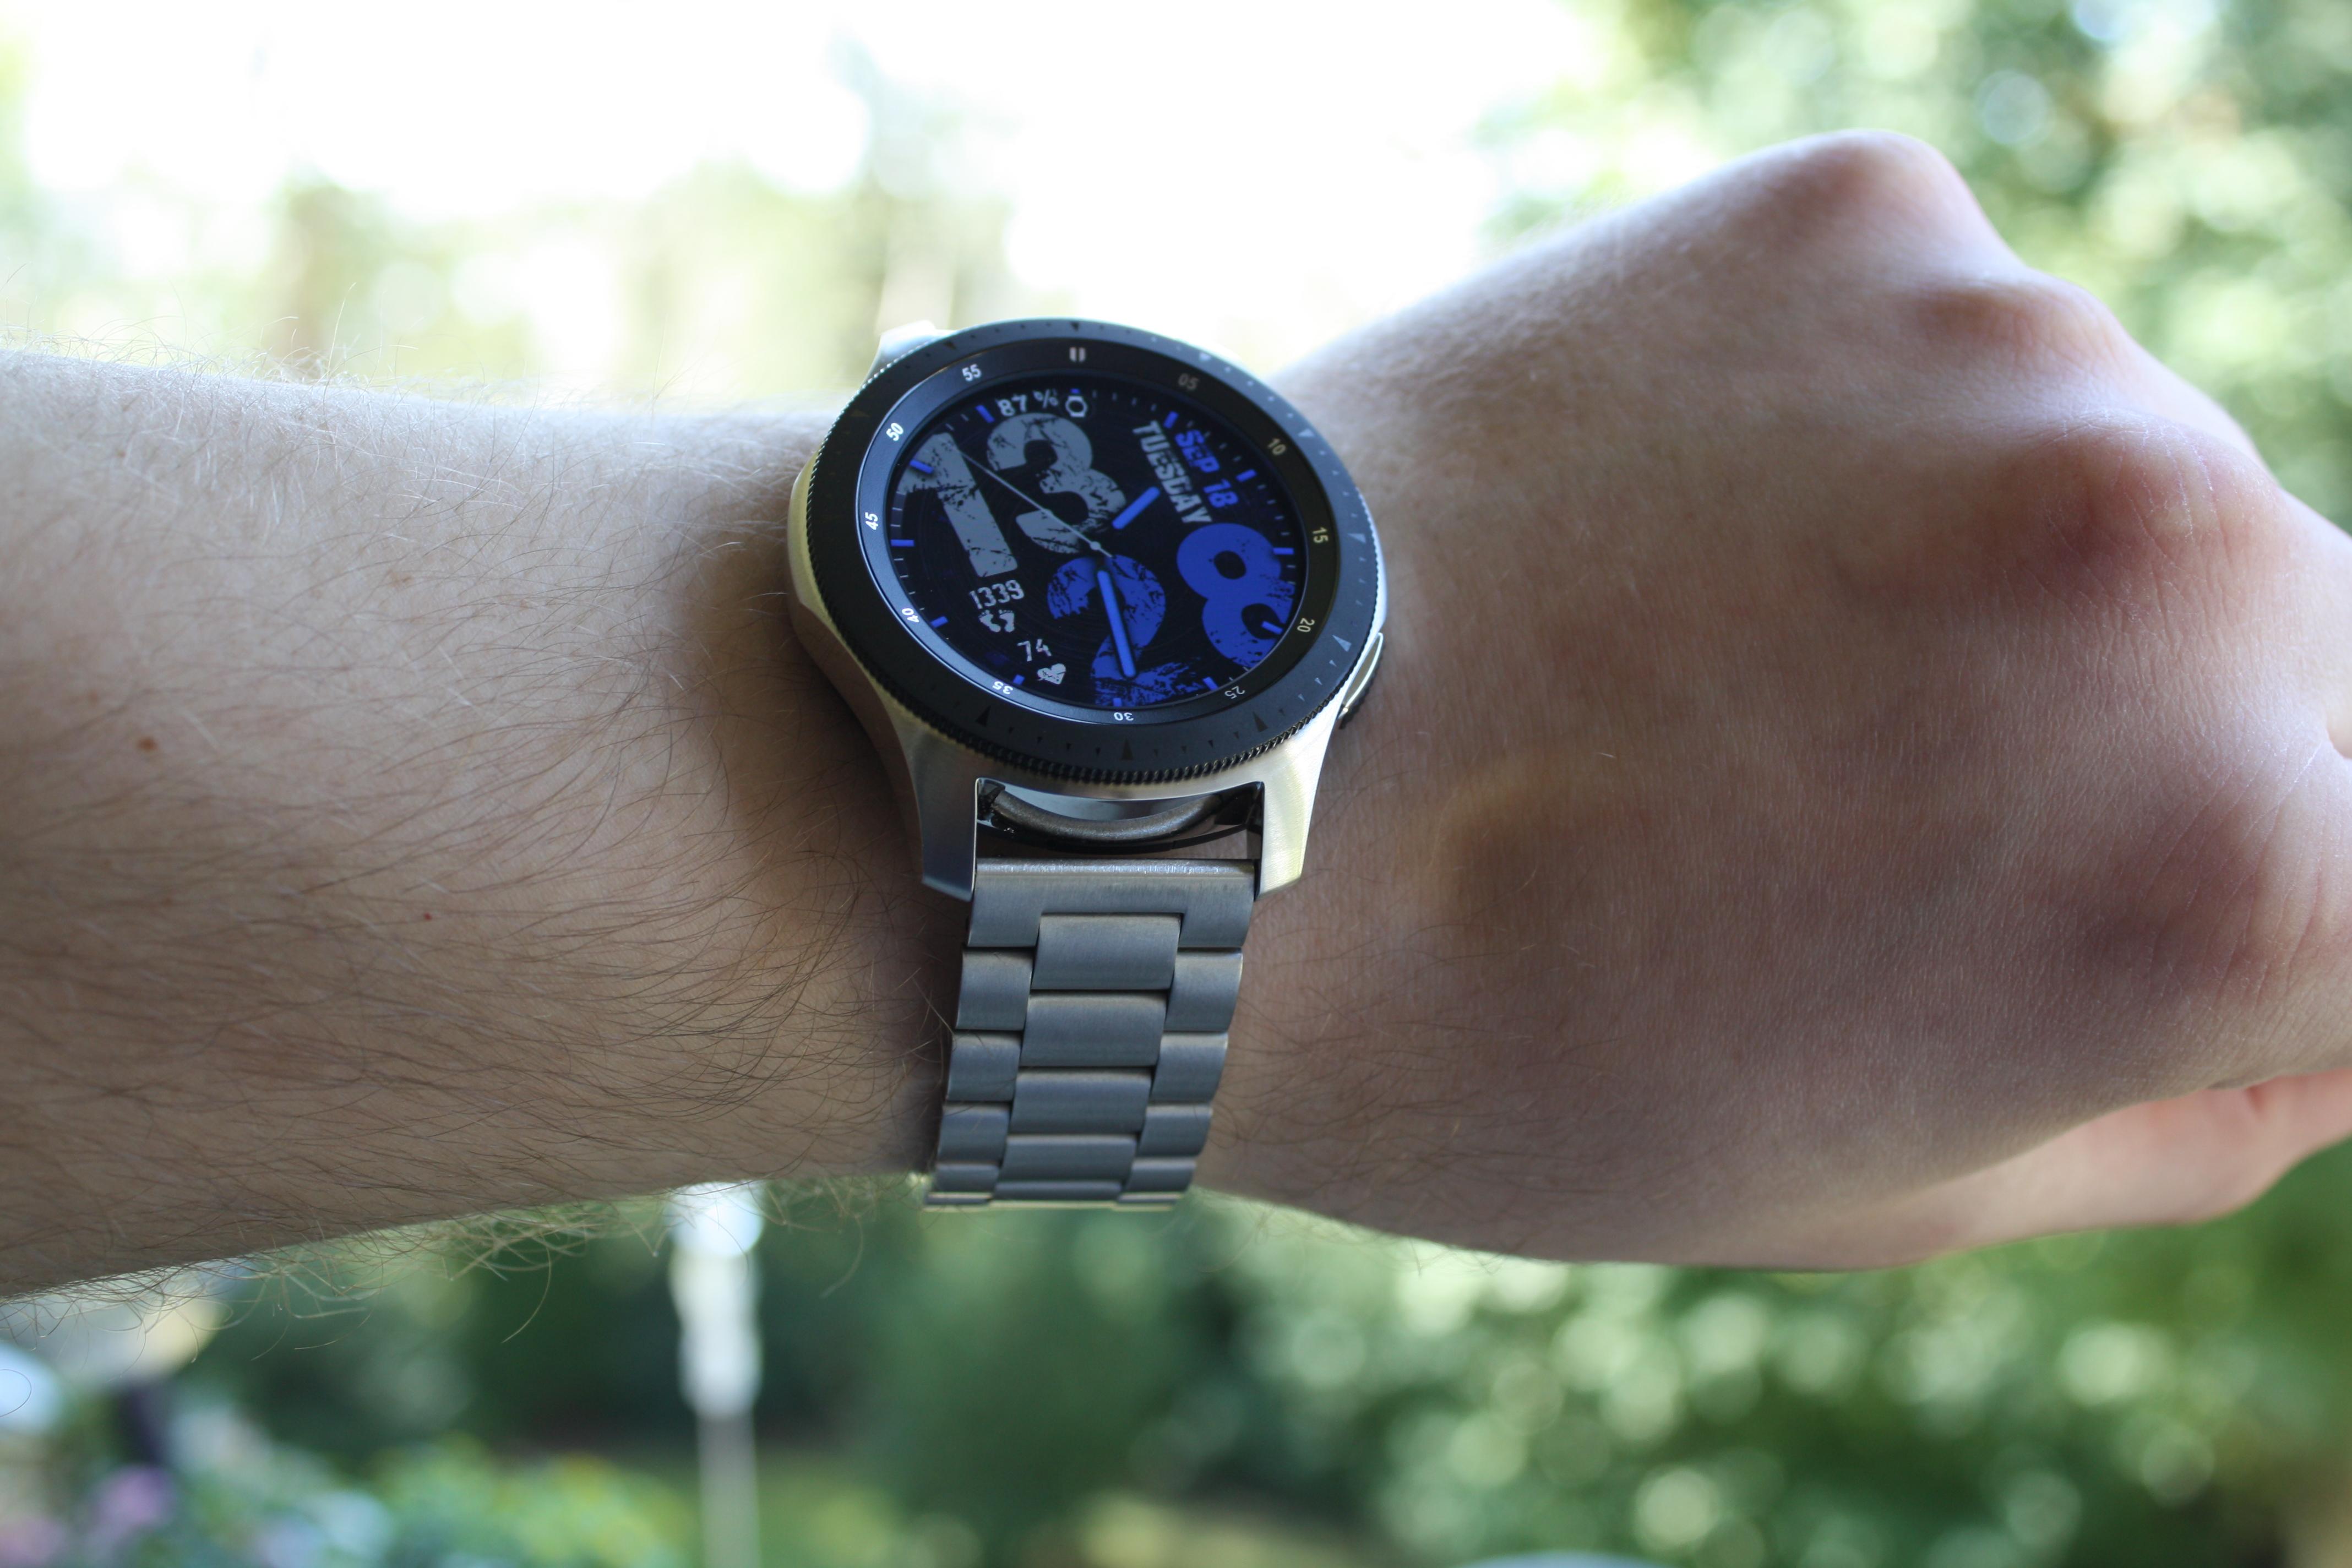 Galaxy watch armbänder